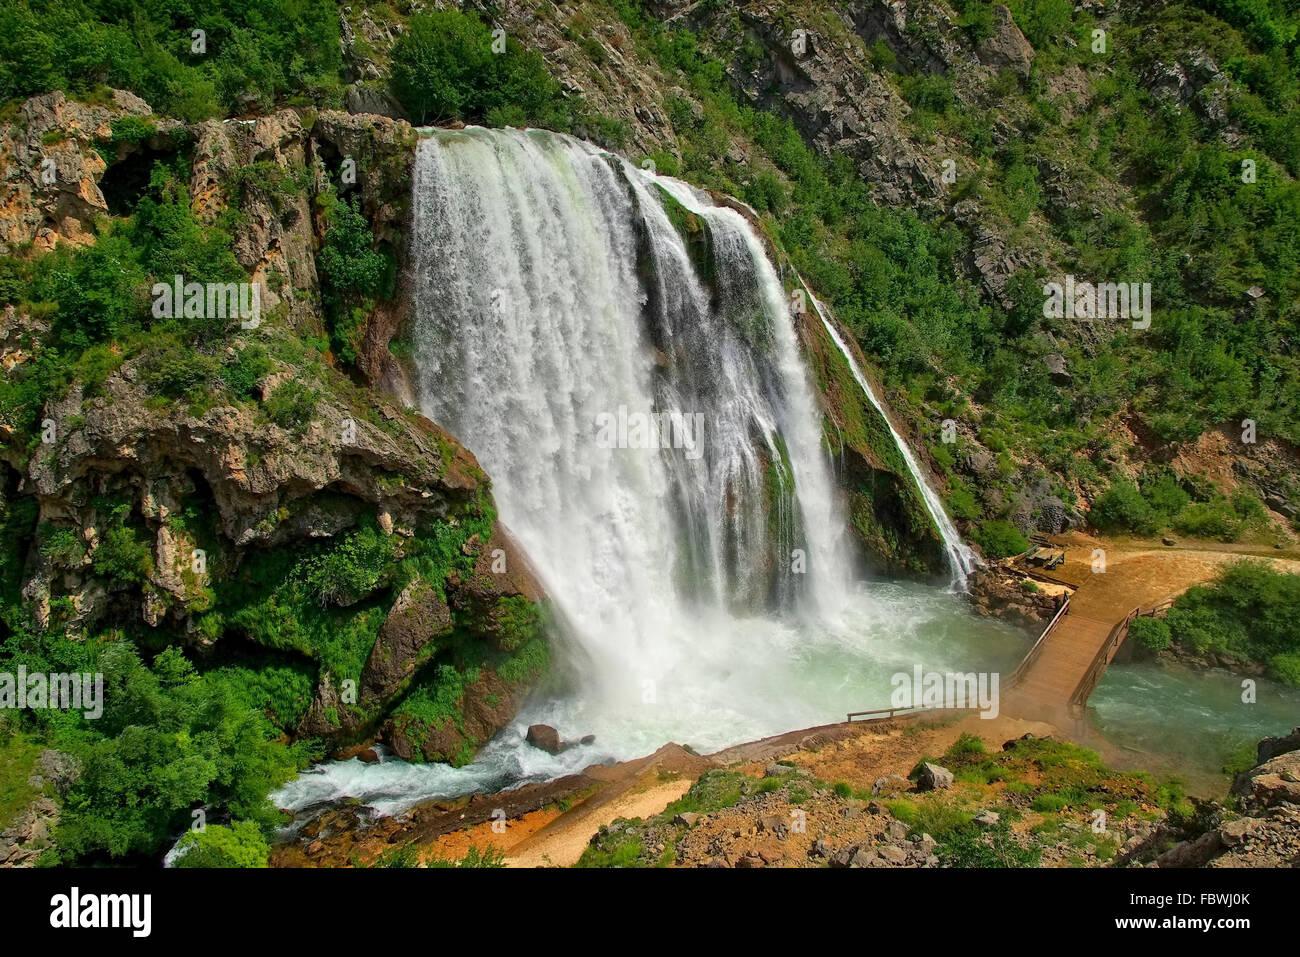 Krcic Wasserfälle - Wasserfall Krcic 15 Stockbild